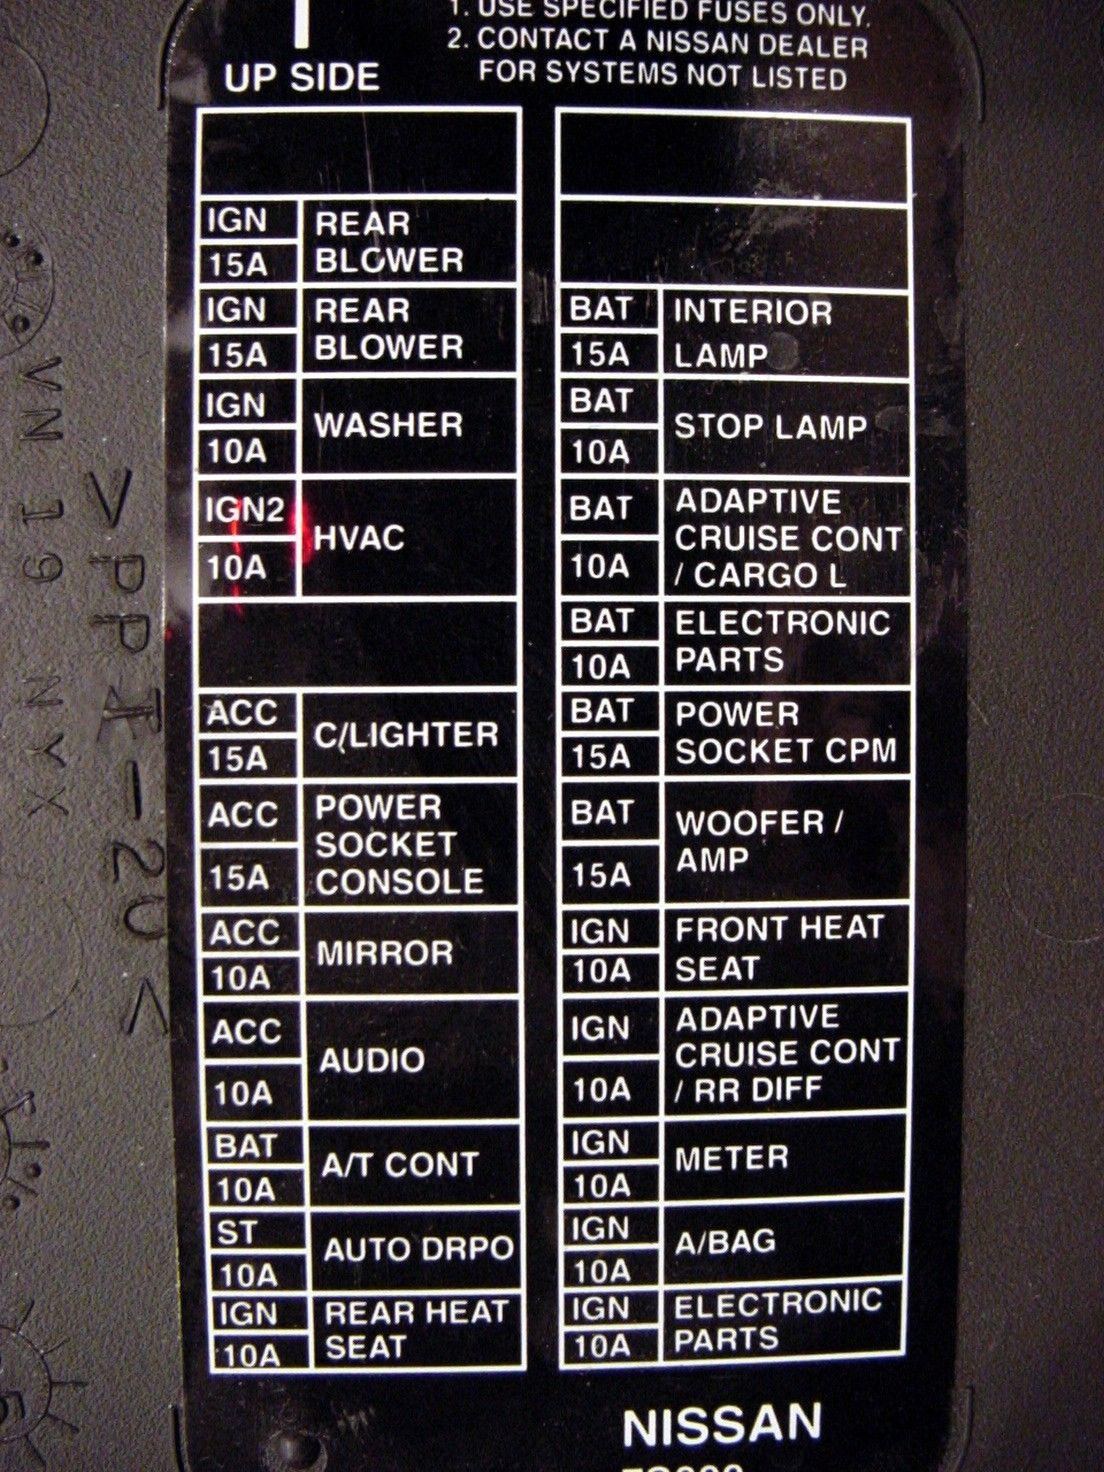 2005 nissan 350z fuse diagram wiring diagram 2004 Nissan 350Z Starter Location